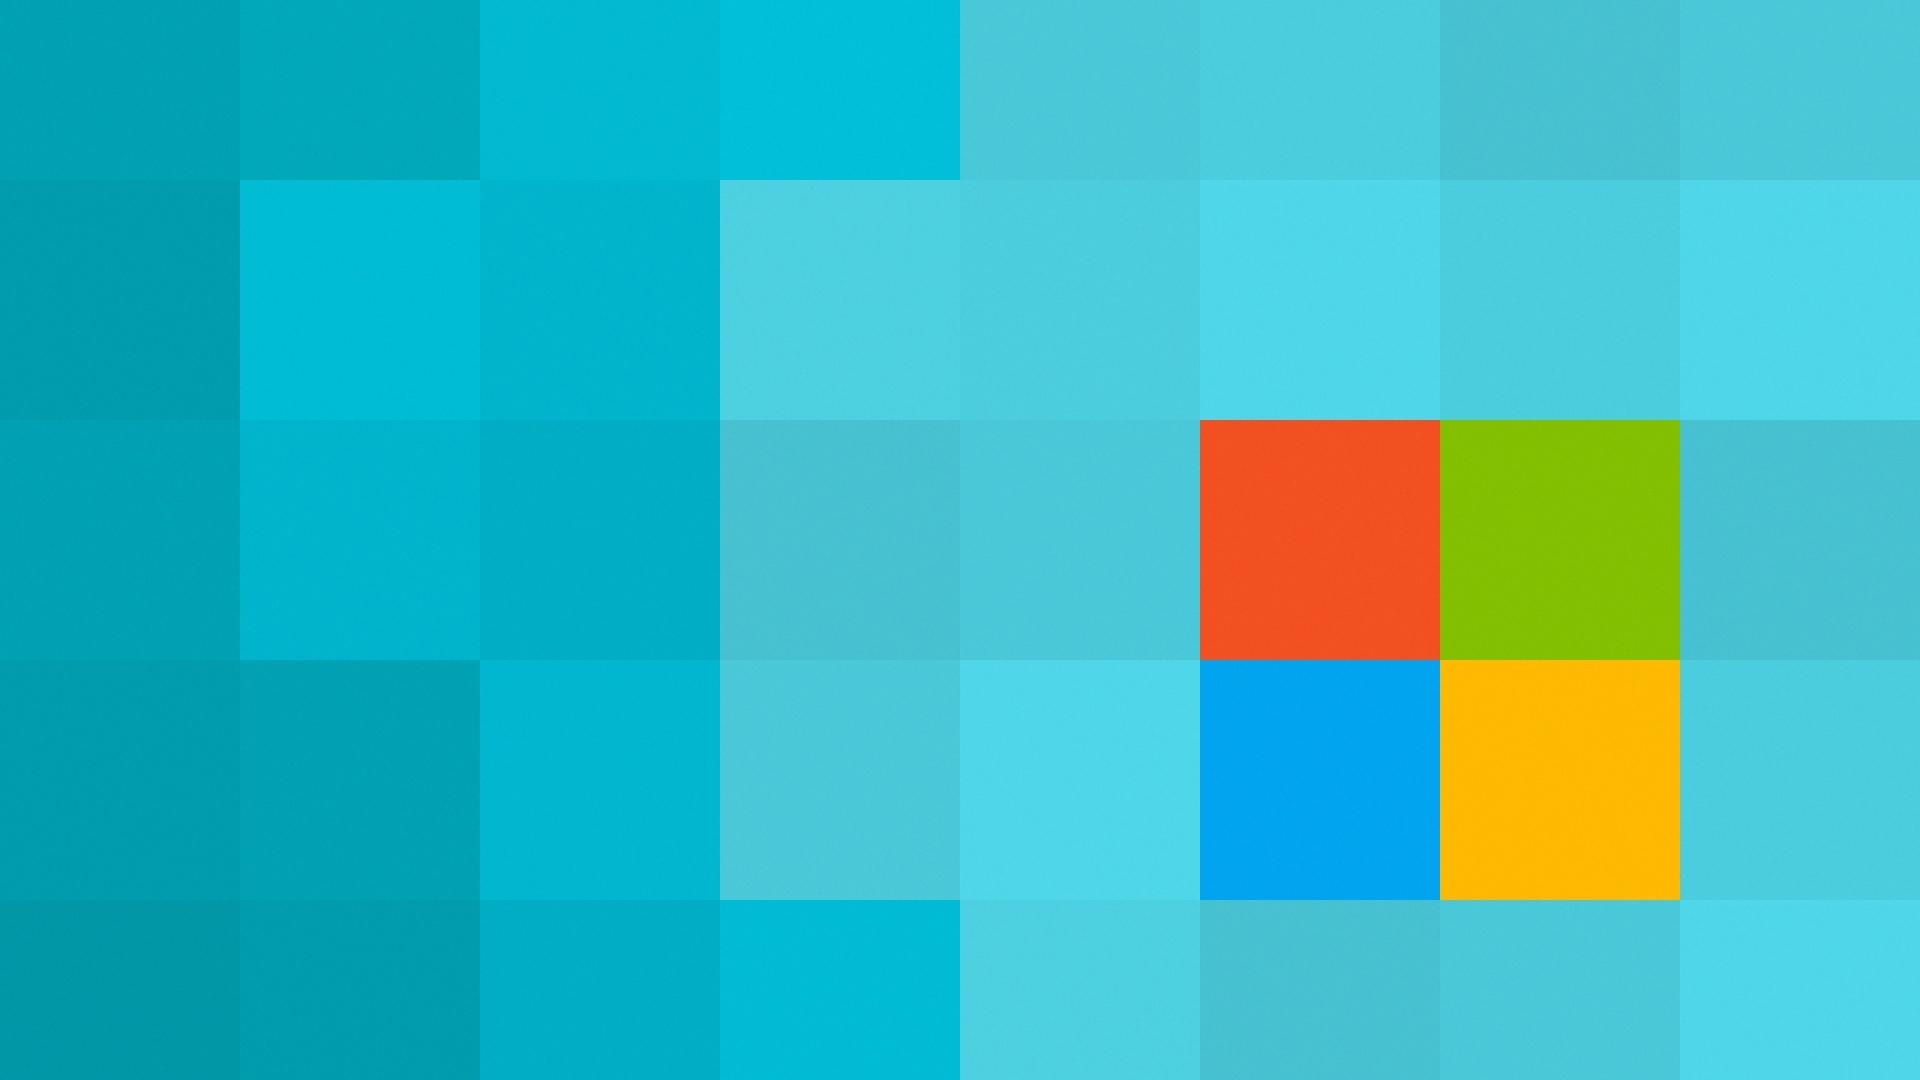 1920x1080 Minimal Windows 10 Laptop Full Hd 1080p Hd 4k Wallpapers